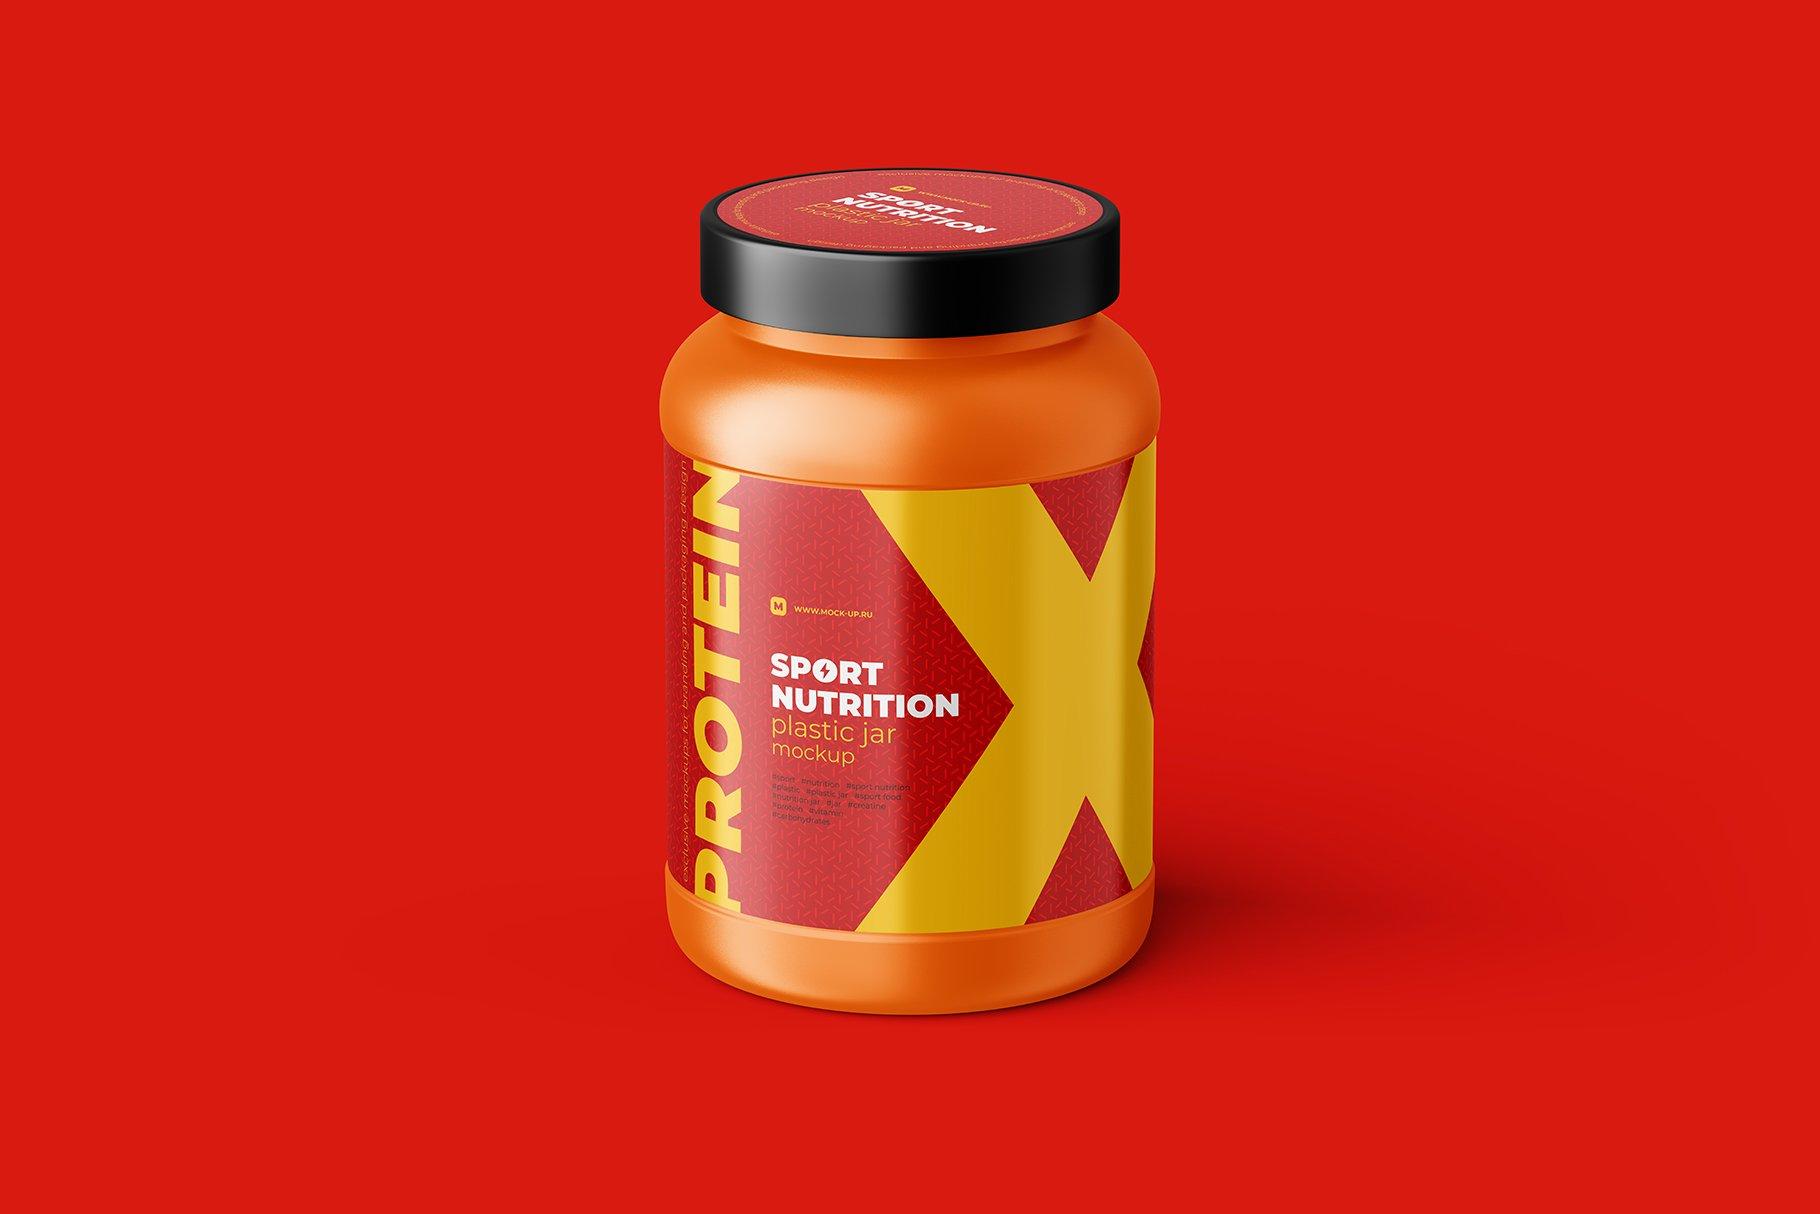 运动营养品果酱塑料罐标签设计展示样机模板 Sport Nutrition Plastic Jar Mockup插图7